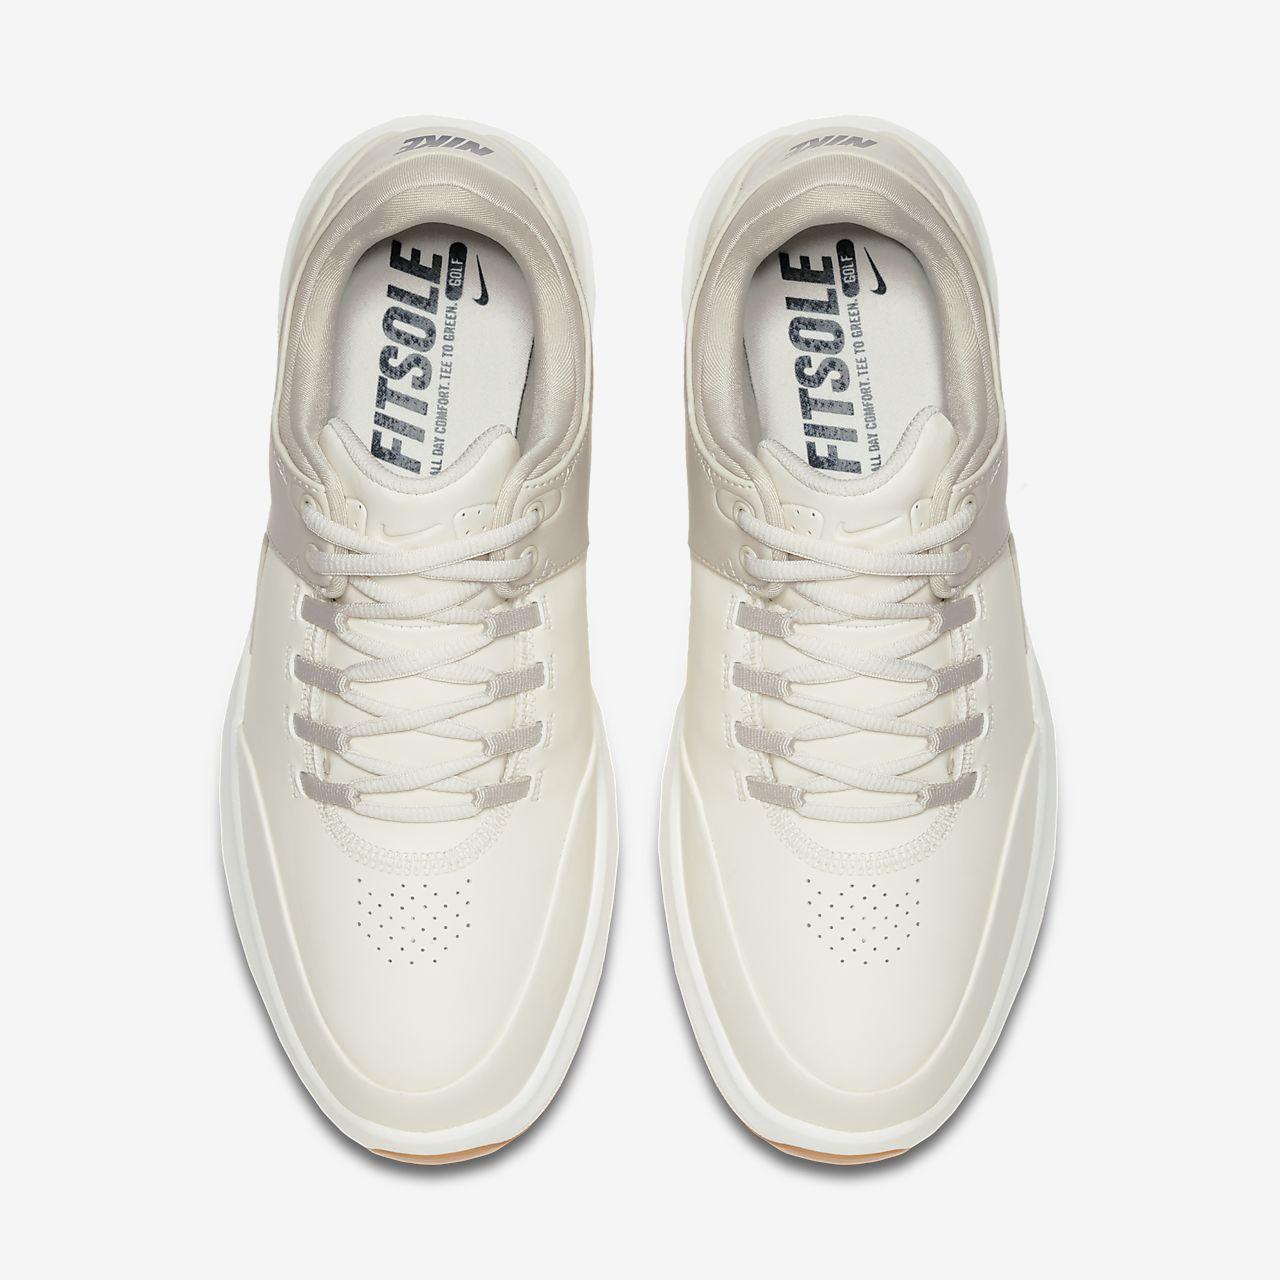 a864ef748dc71 Nike Air Zoom Accurate Men s Golf Shoe. Nike.com MA